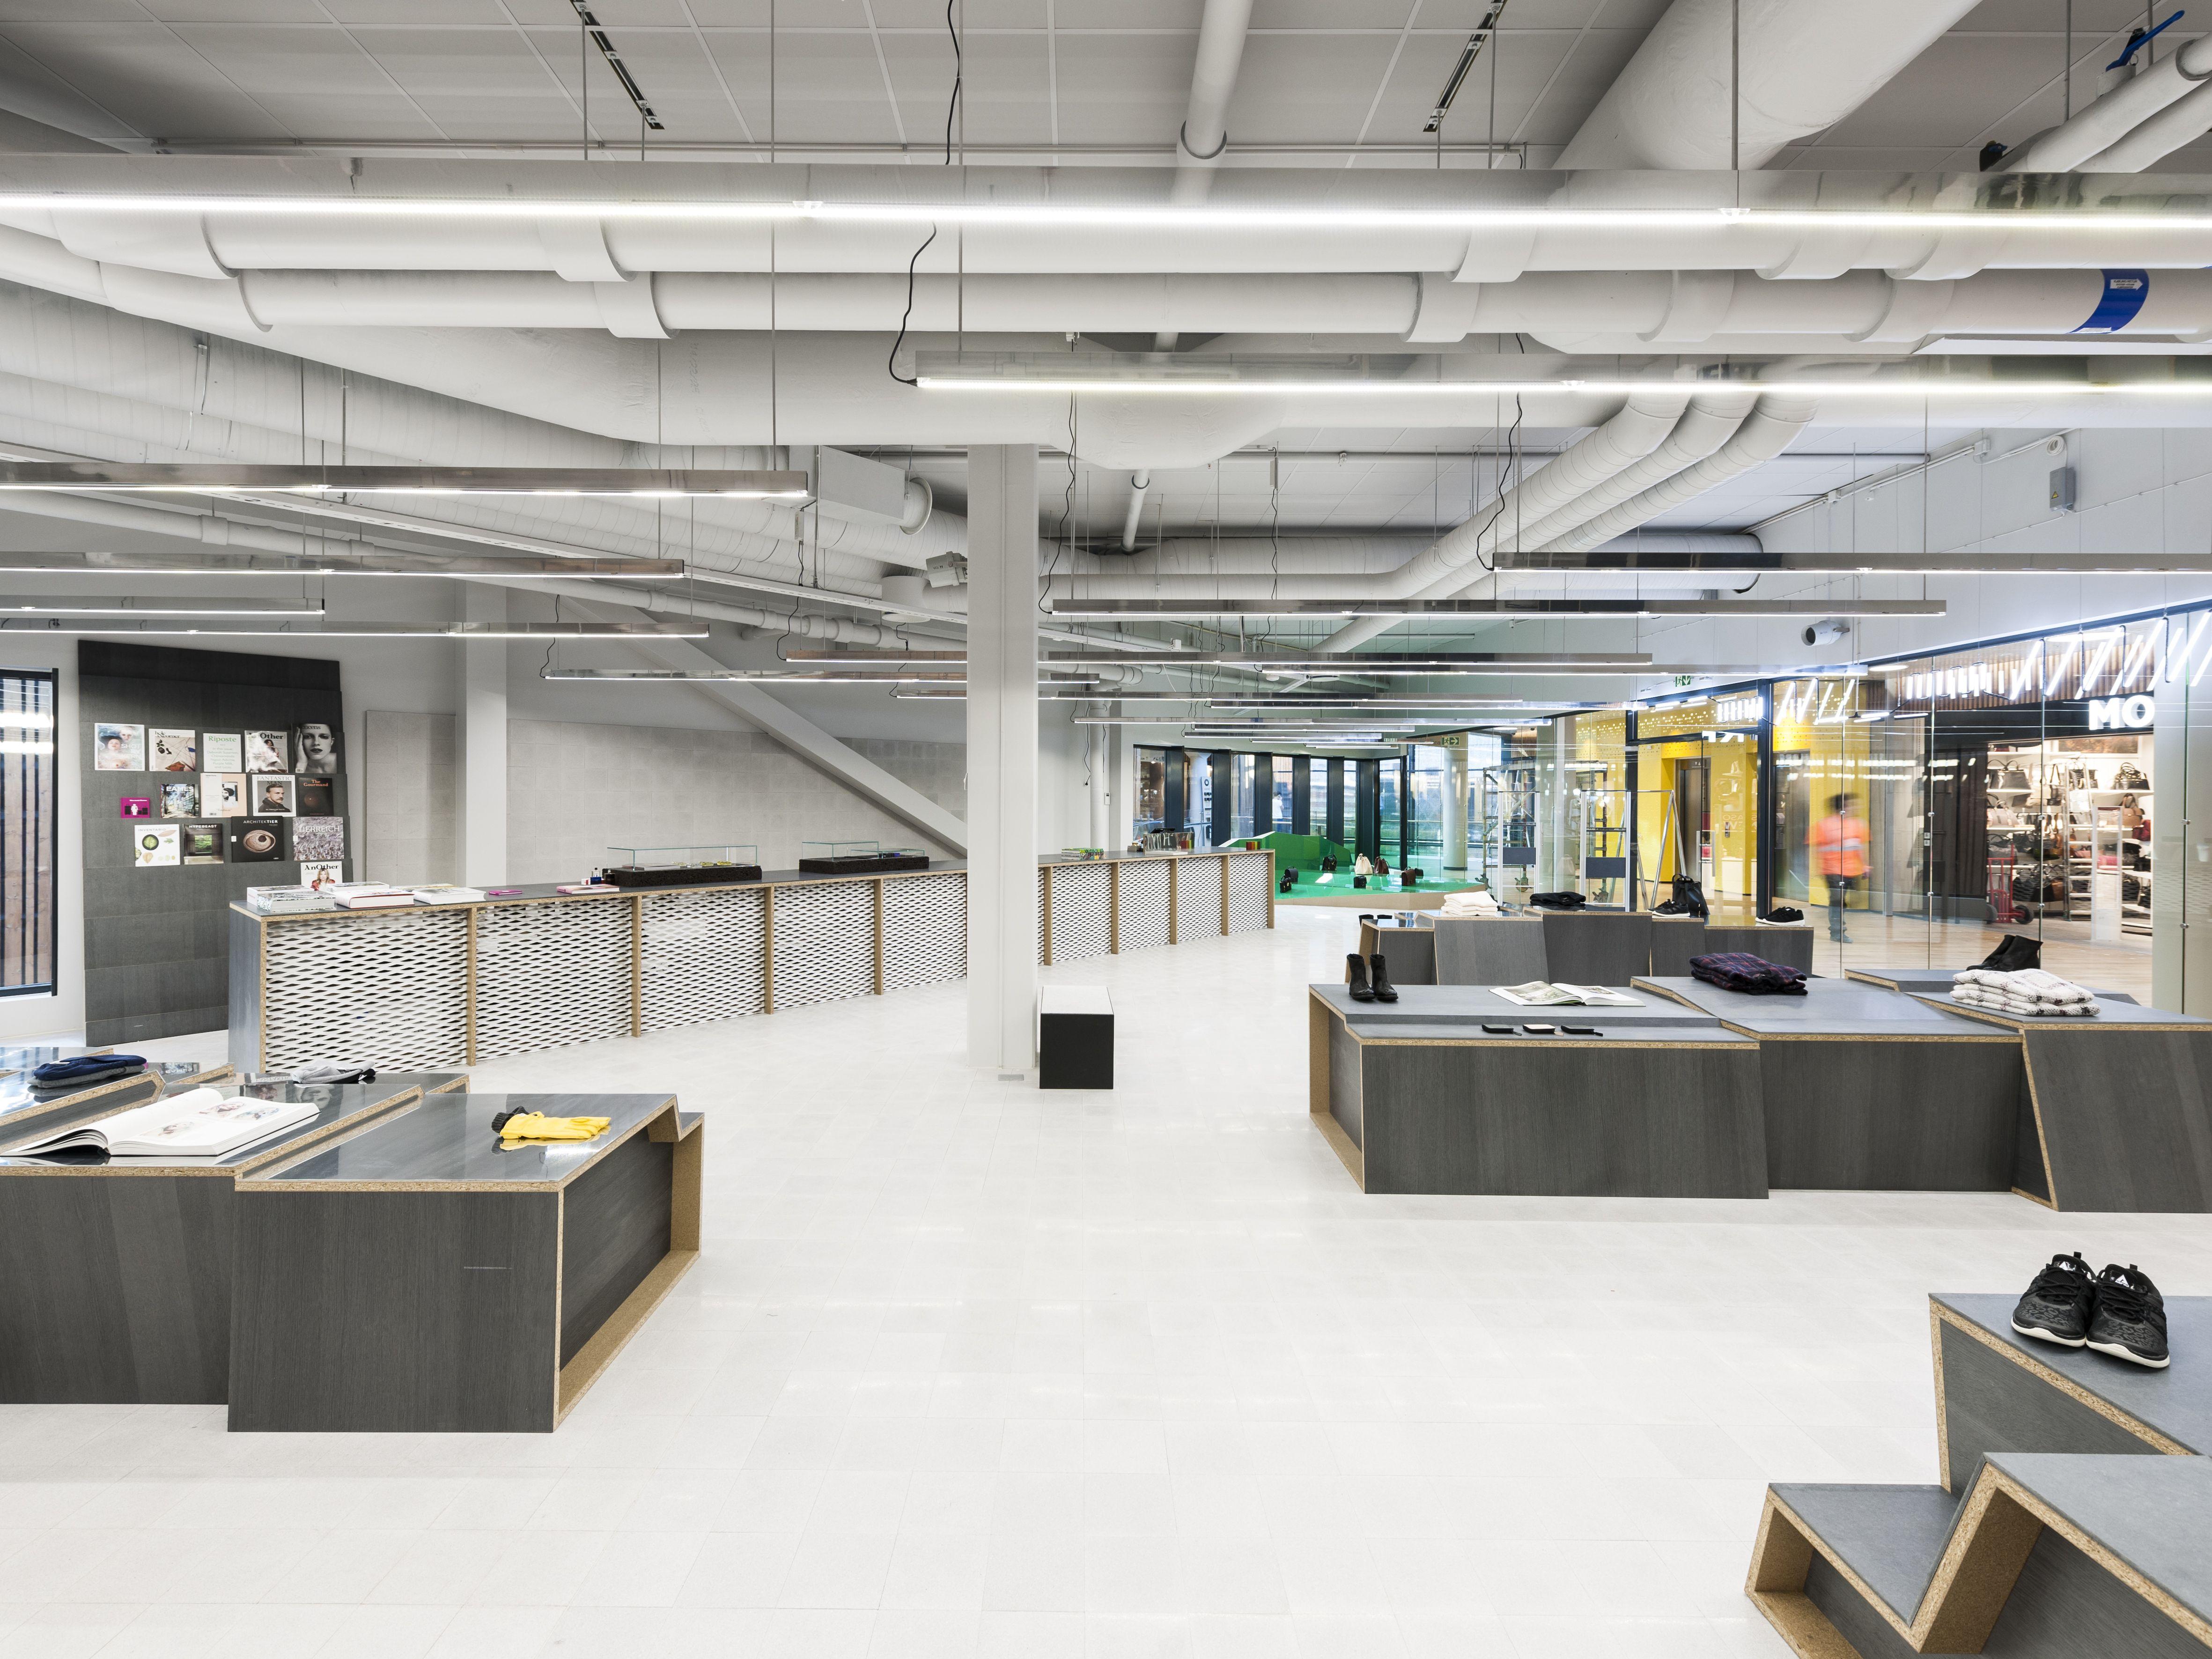 Holzweiler Store / Designers: Gonzalez Haase AAS / Photographer: Thomas  Meyer U2013 Ostkreuz /